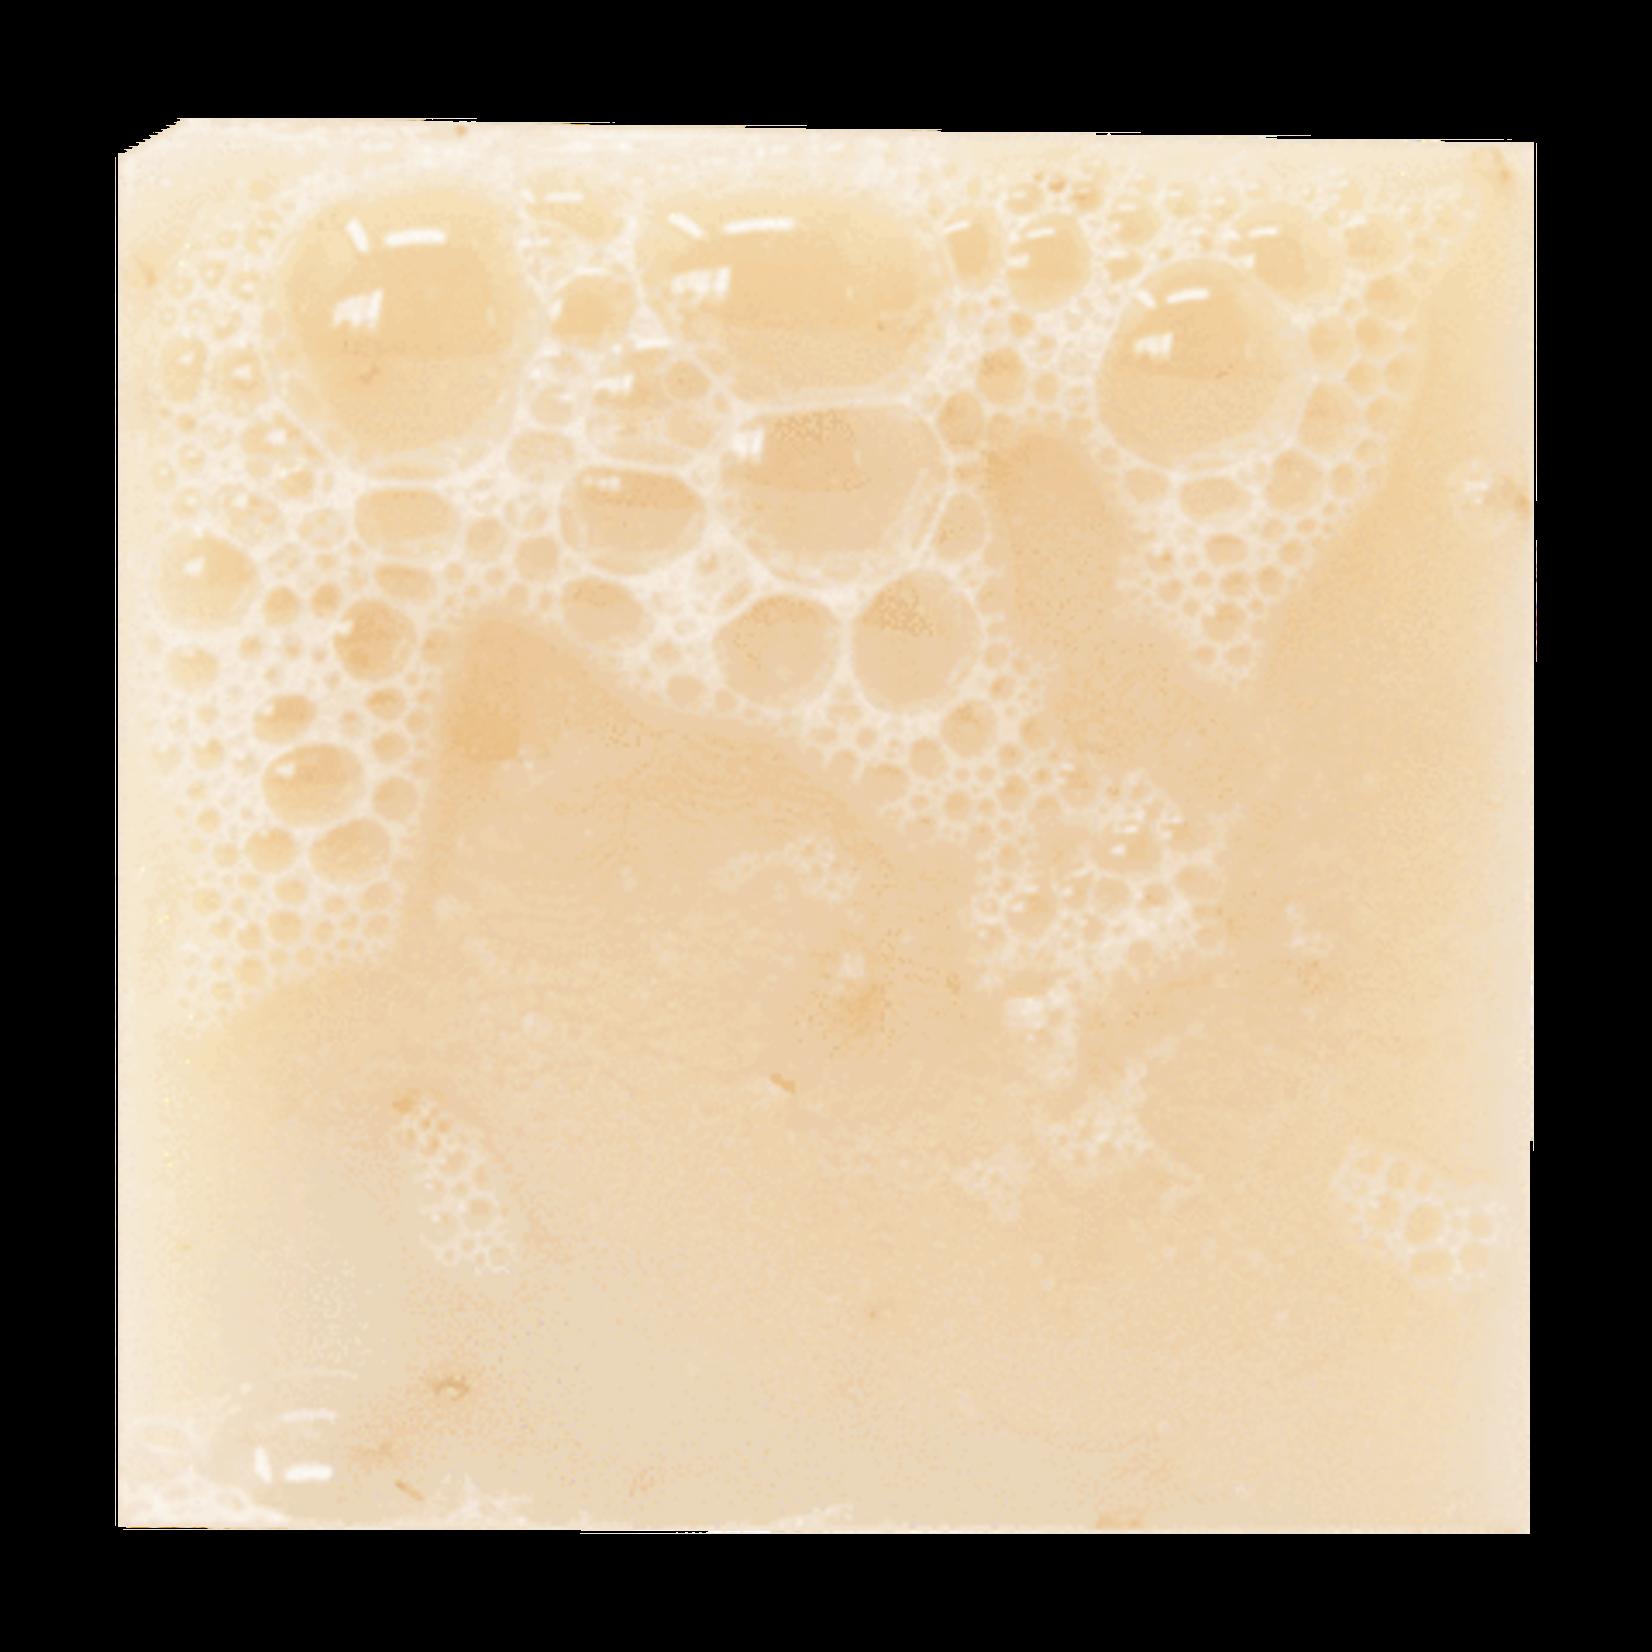 Dr Squatch Bar Soap 5 oz - Deep Sea Goats Milk